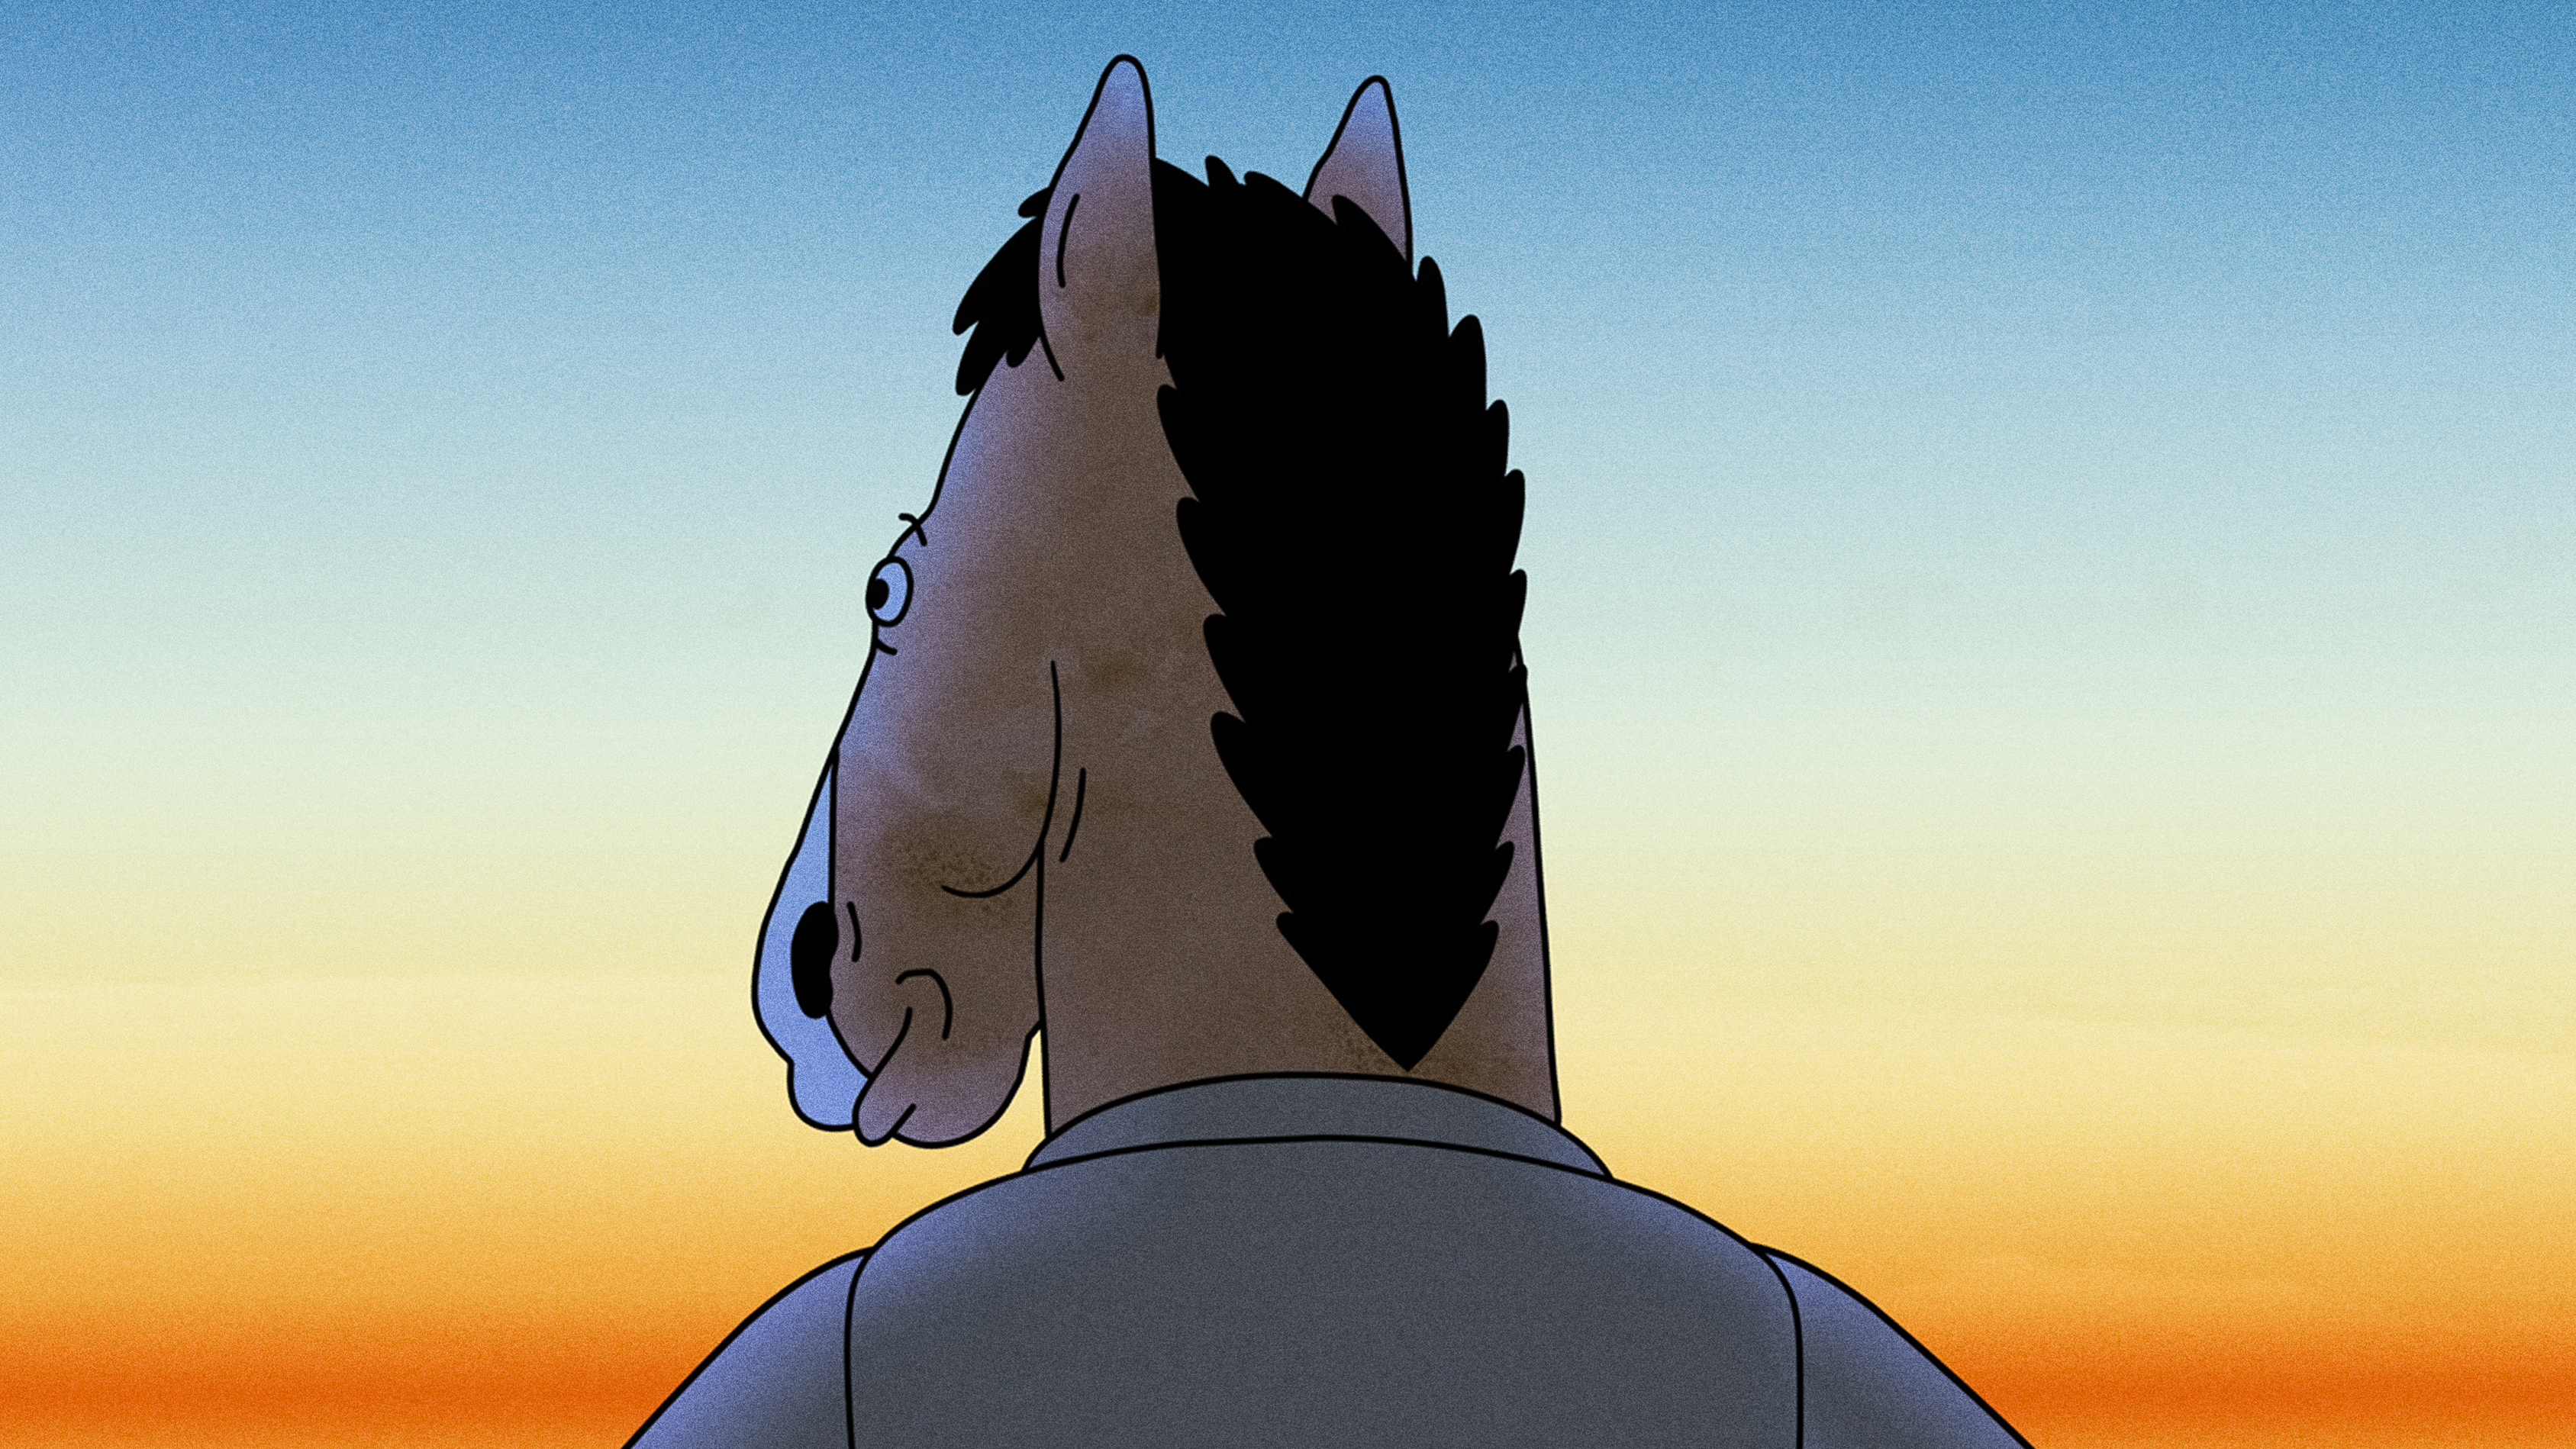 Bojack Horseman Season 6 Poster Hd Tv Shows 4k Wallpapers